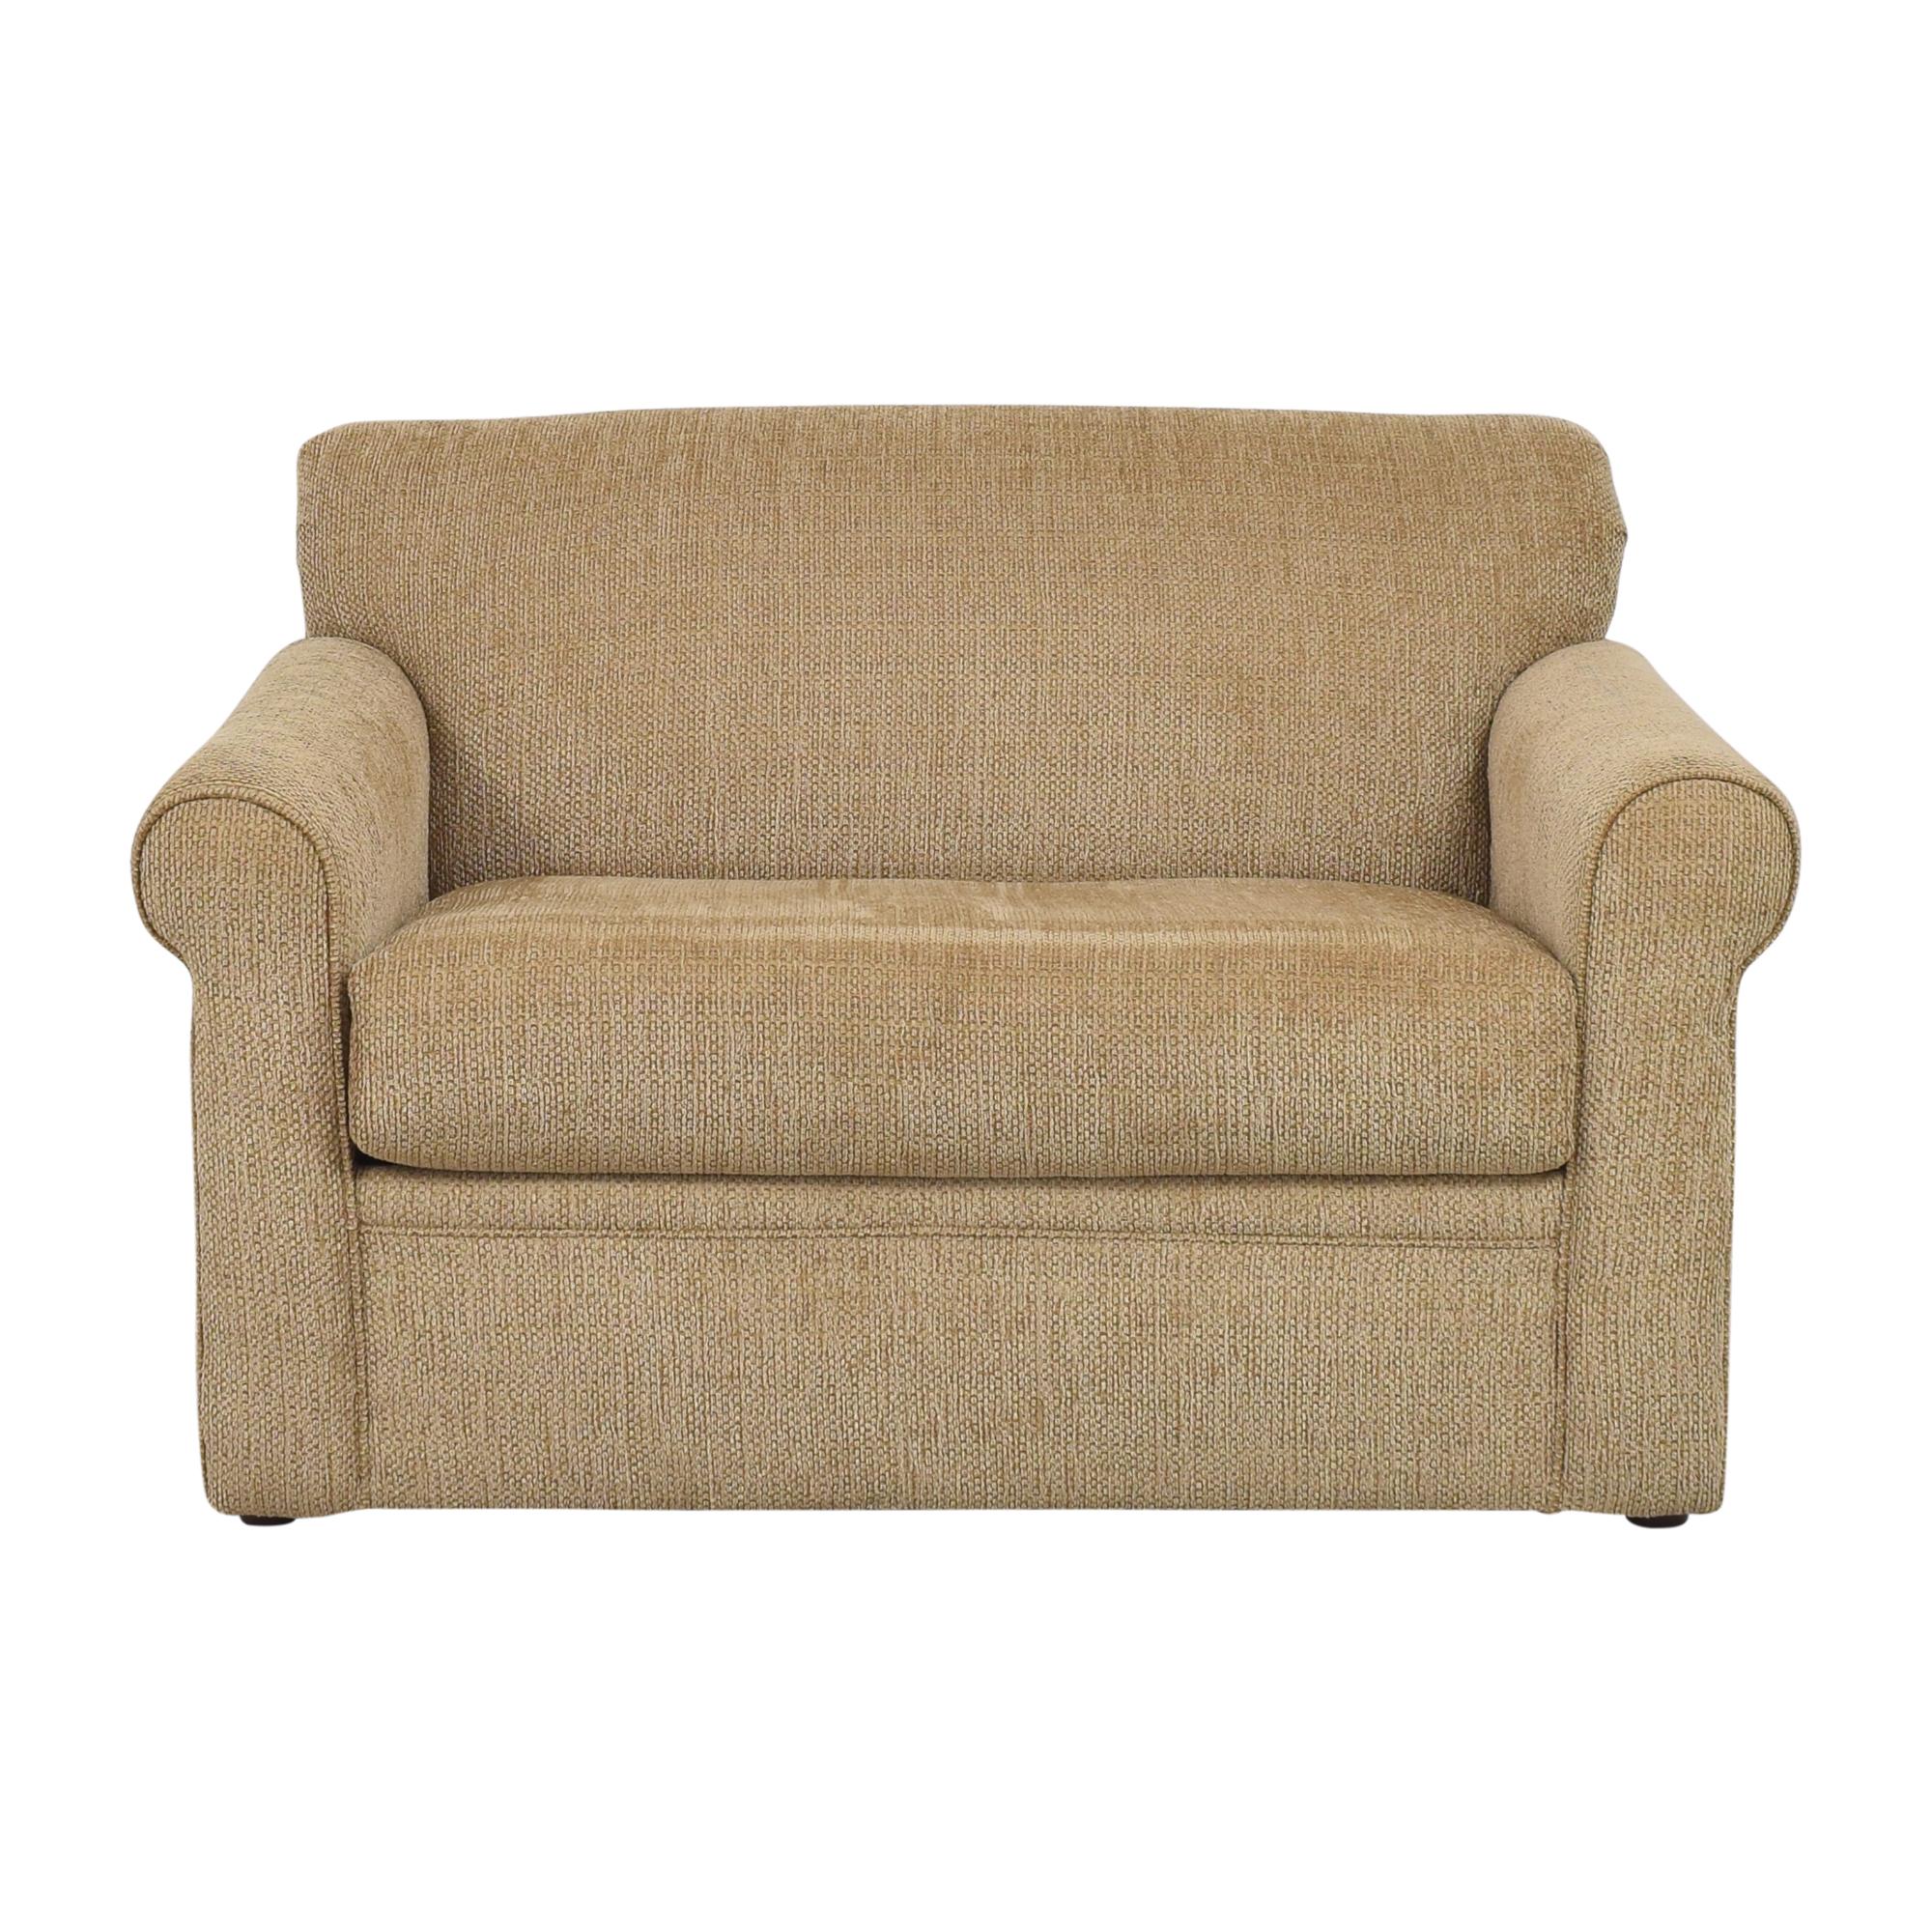 Overnight Sofa Overnight Sofa Sleeper Chair Sofas